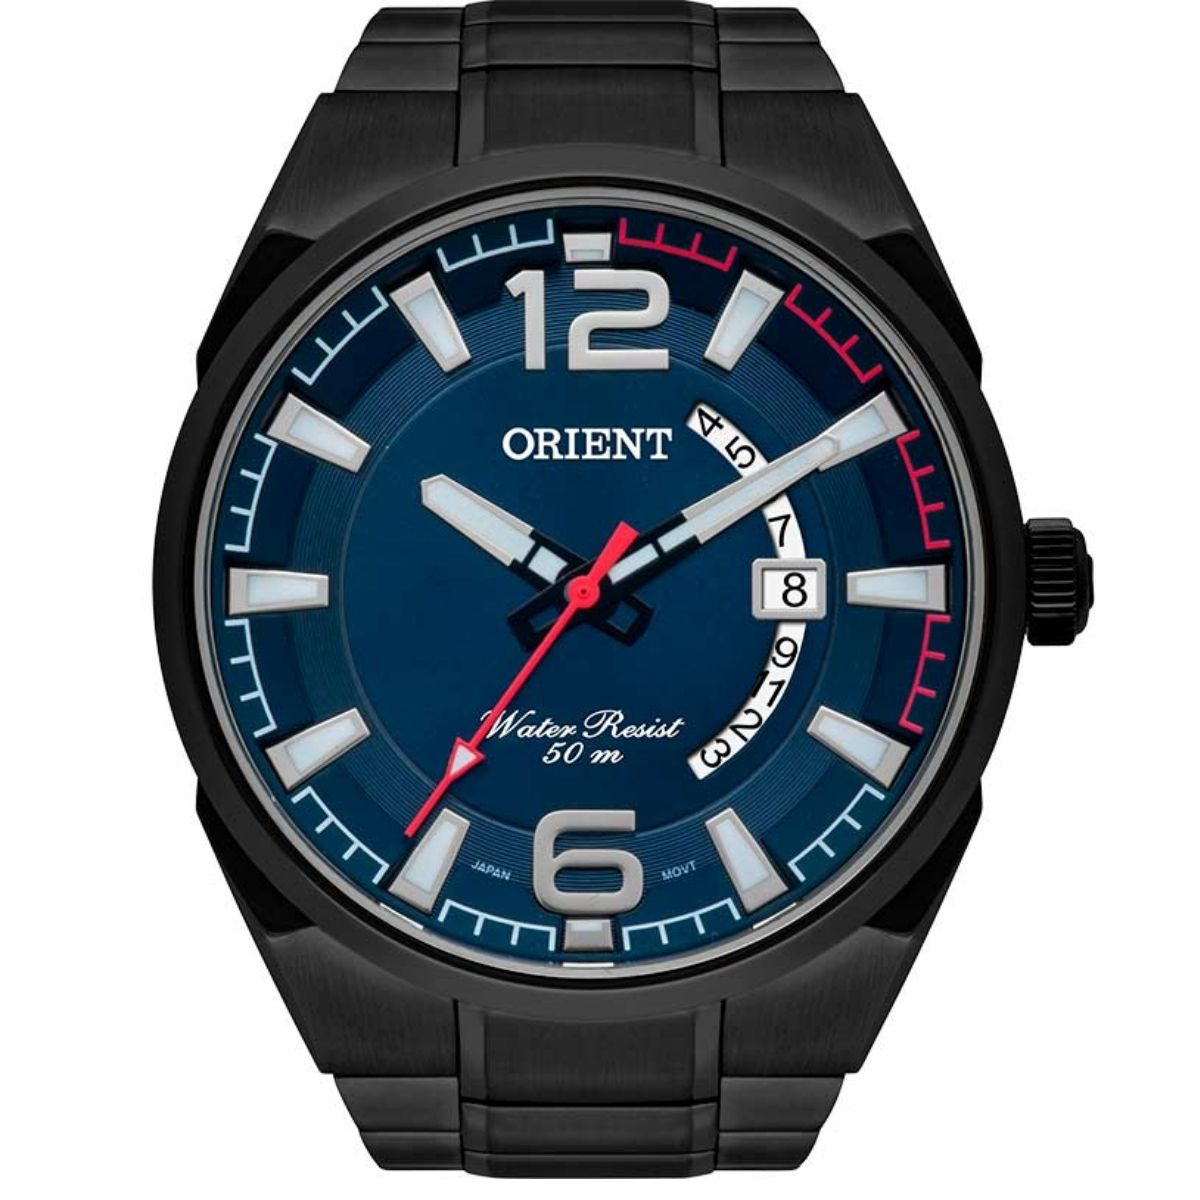 Relógio Masculino Orient  Chumbo MPSS1007